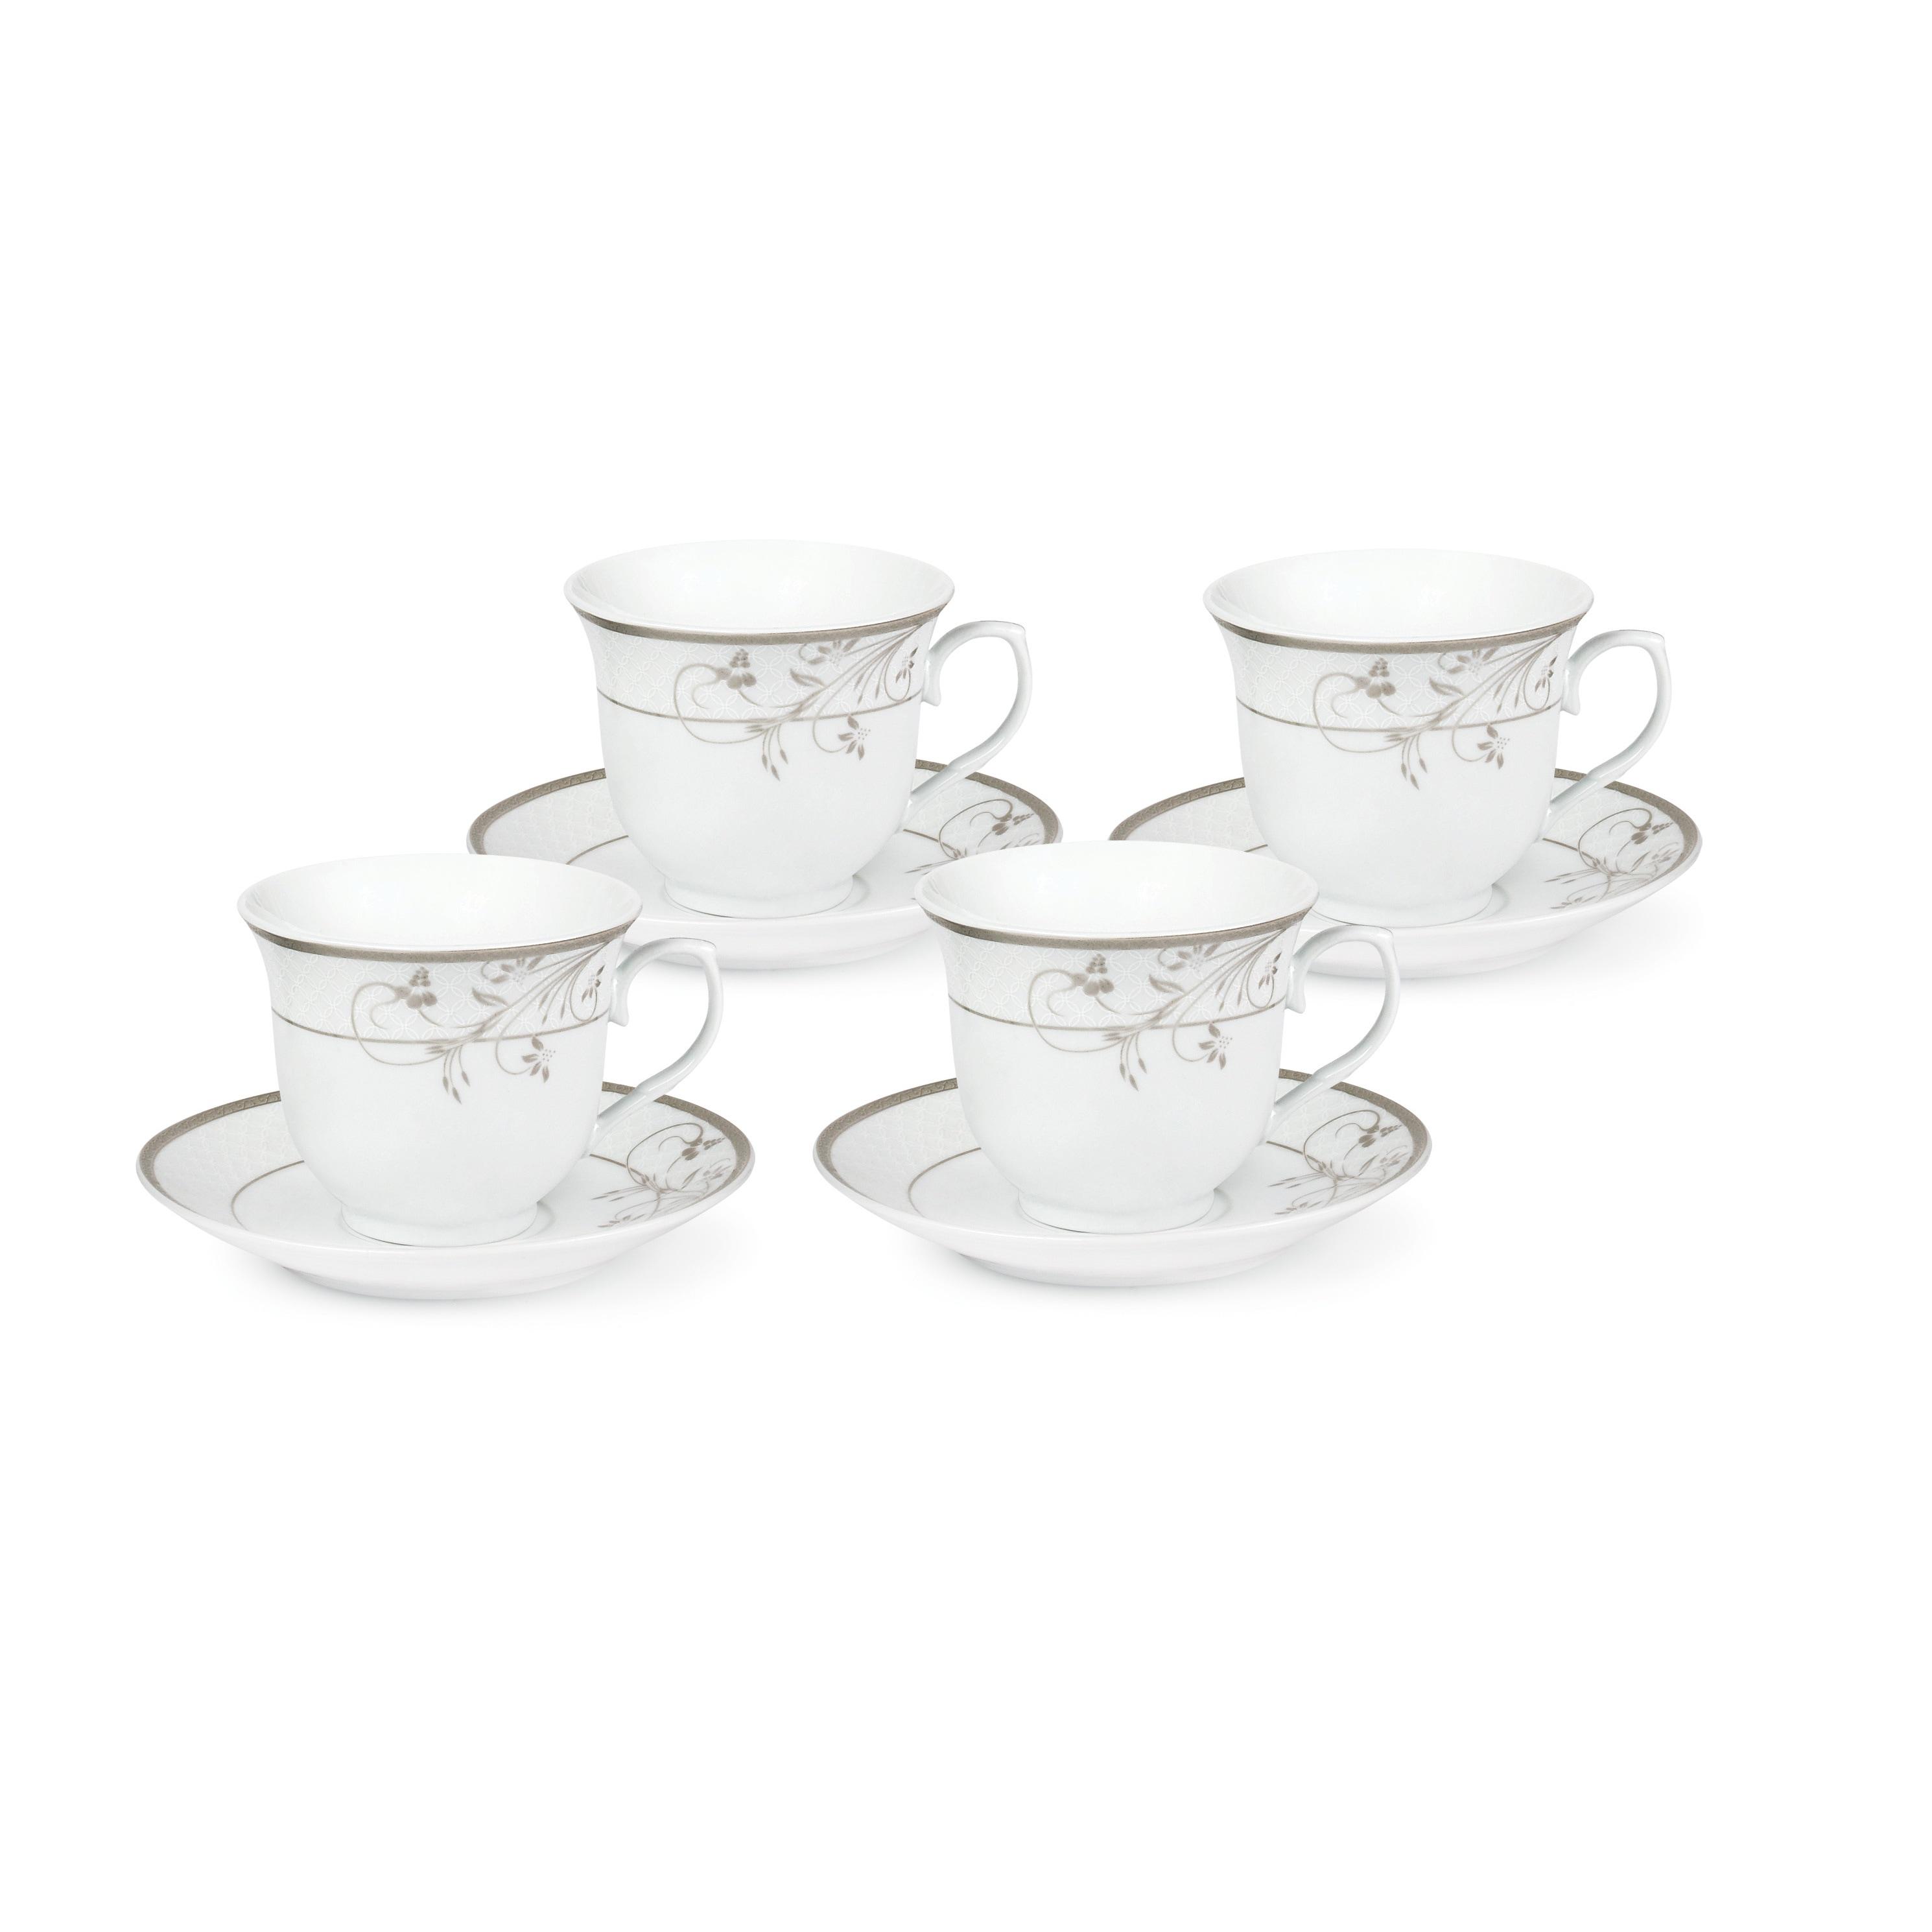 Lorren Home Trends Silver Floral Design Tea Service or Co...